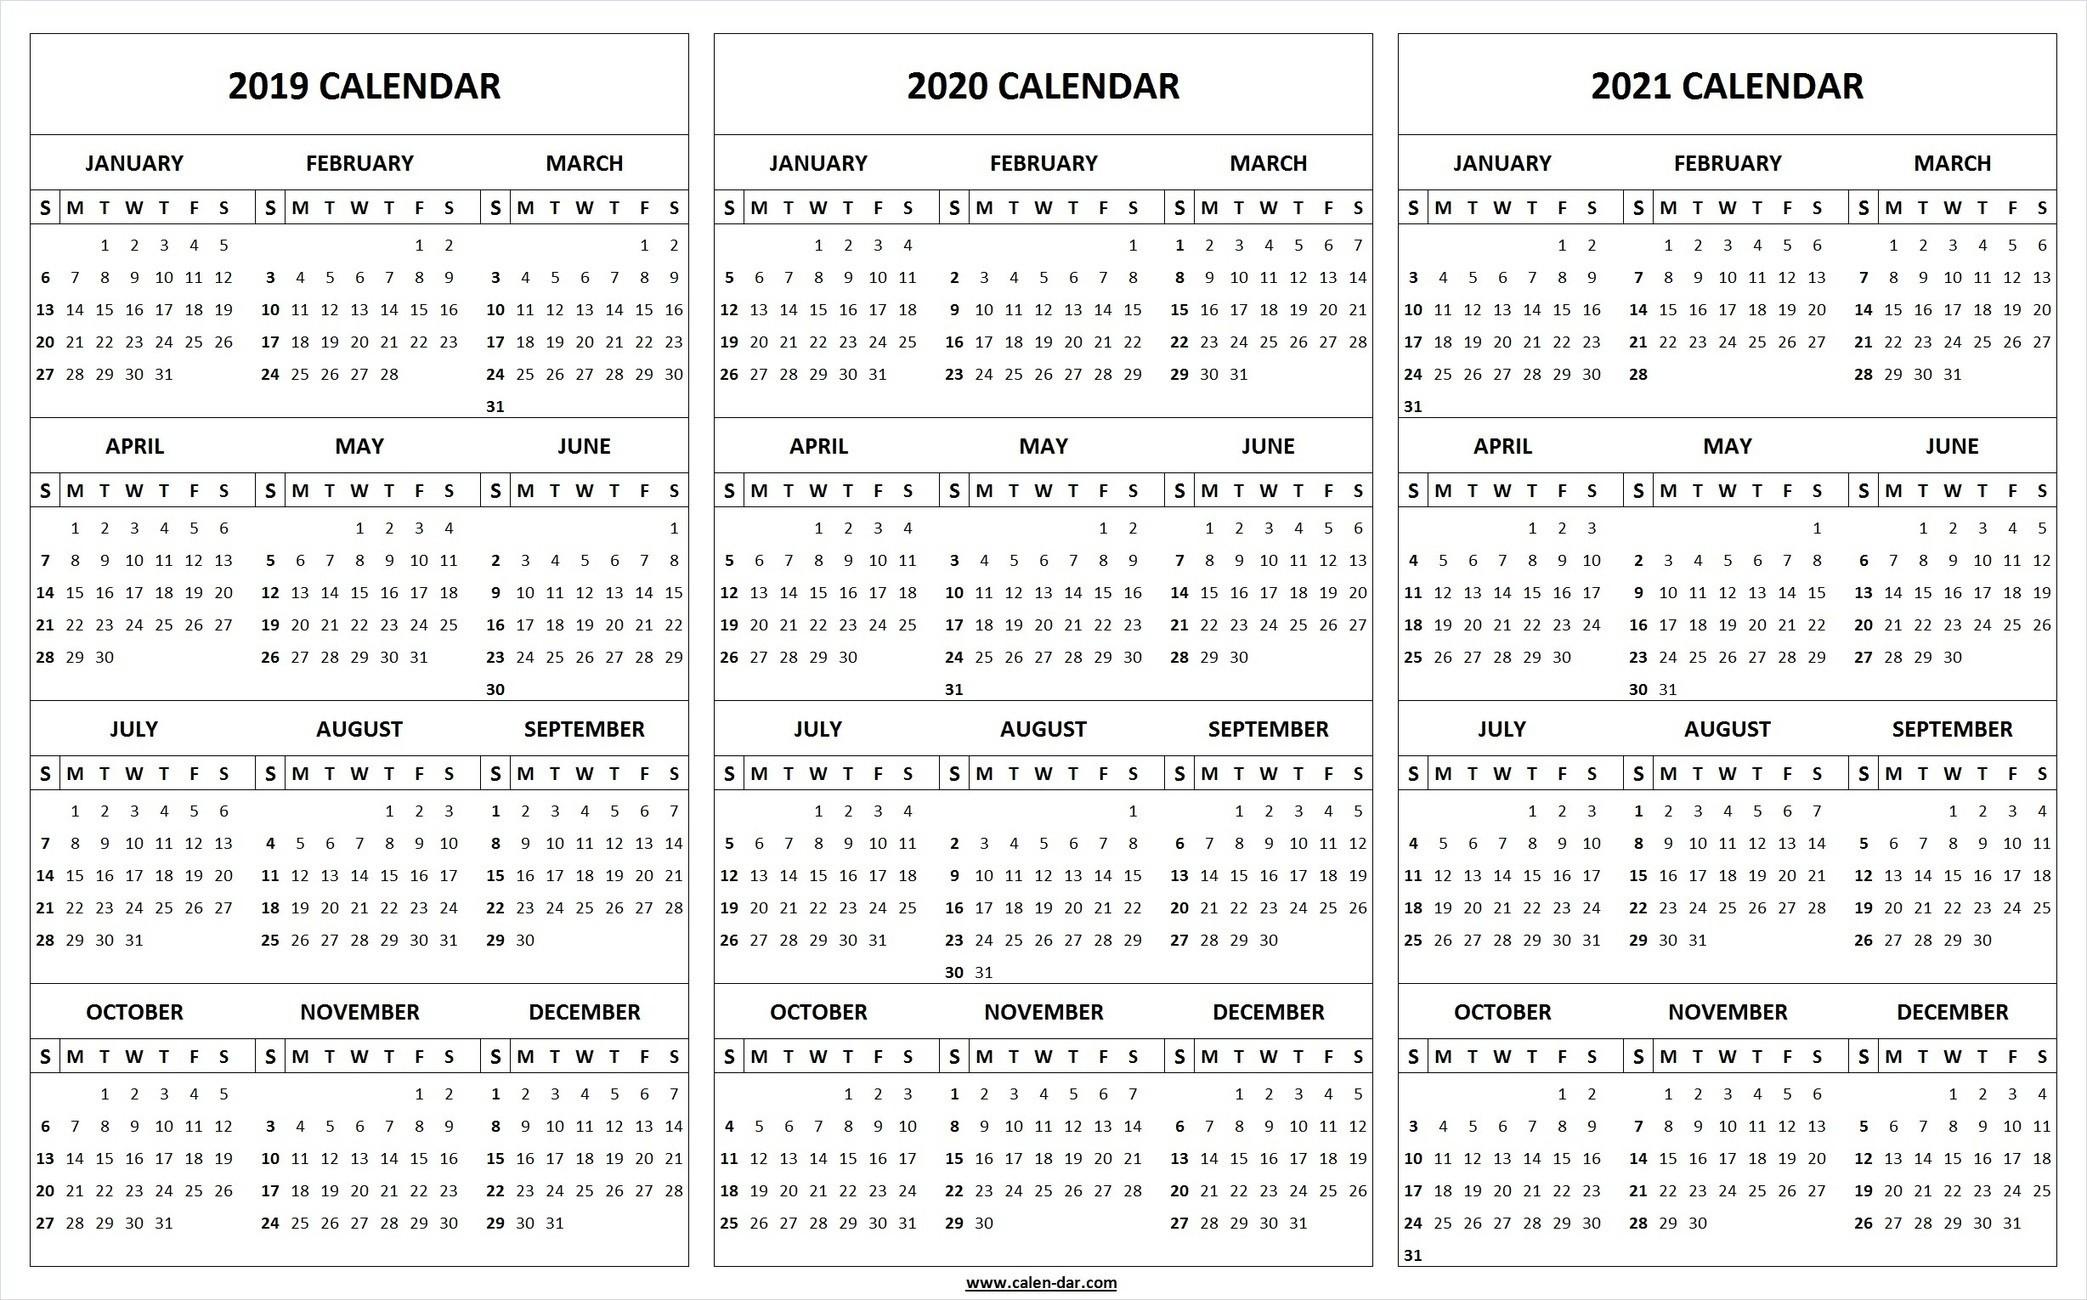 Printable 2019 2020 2021 Calendar Template